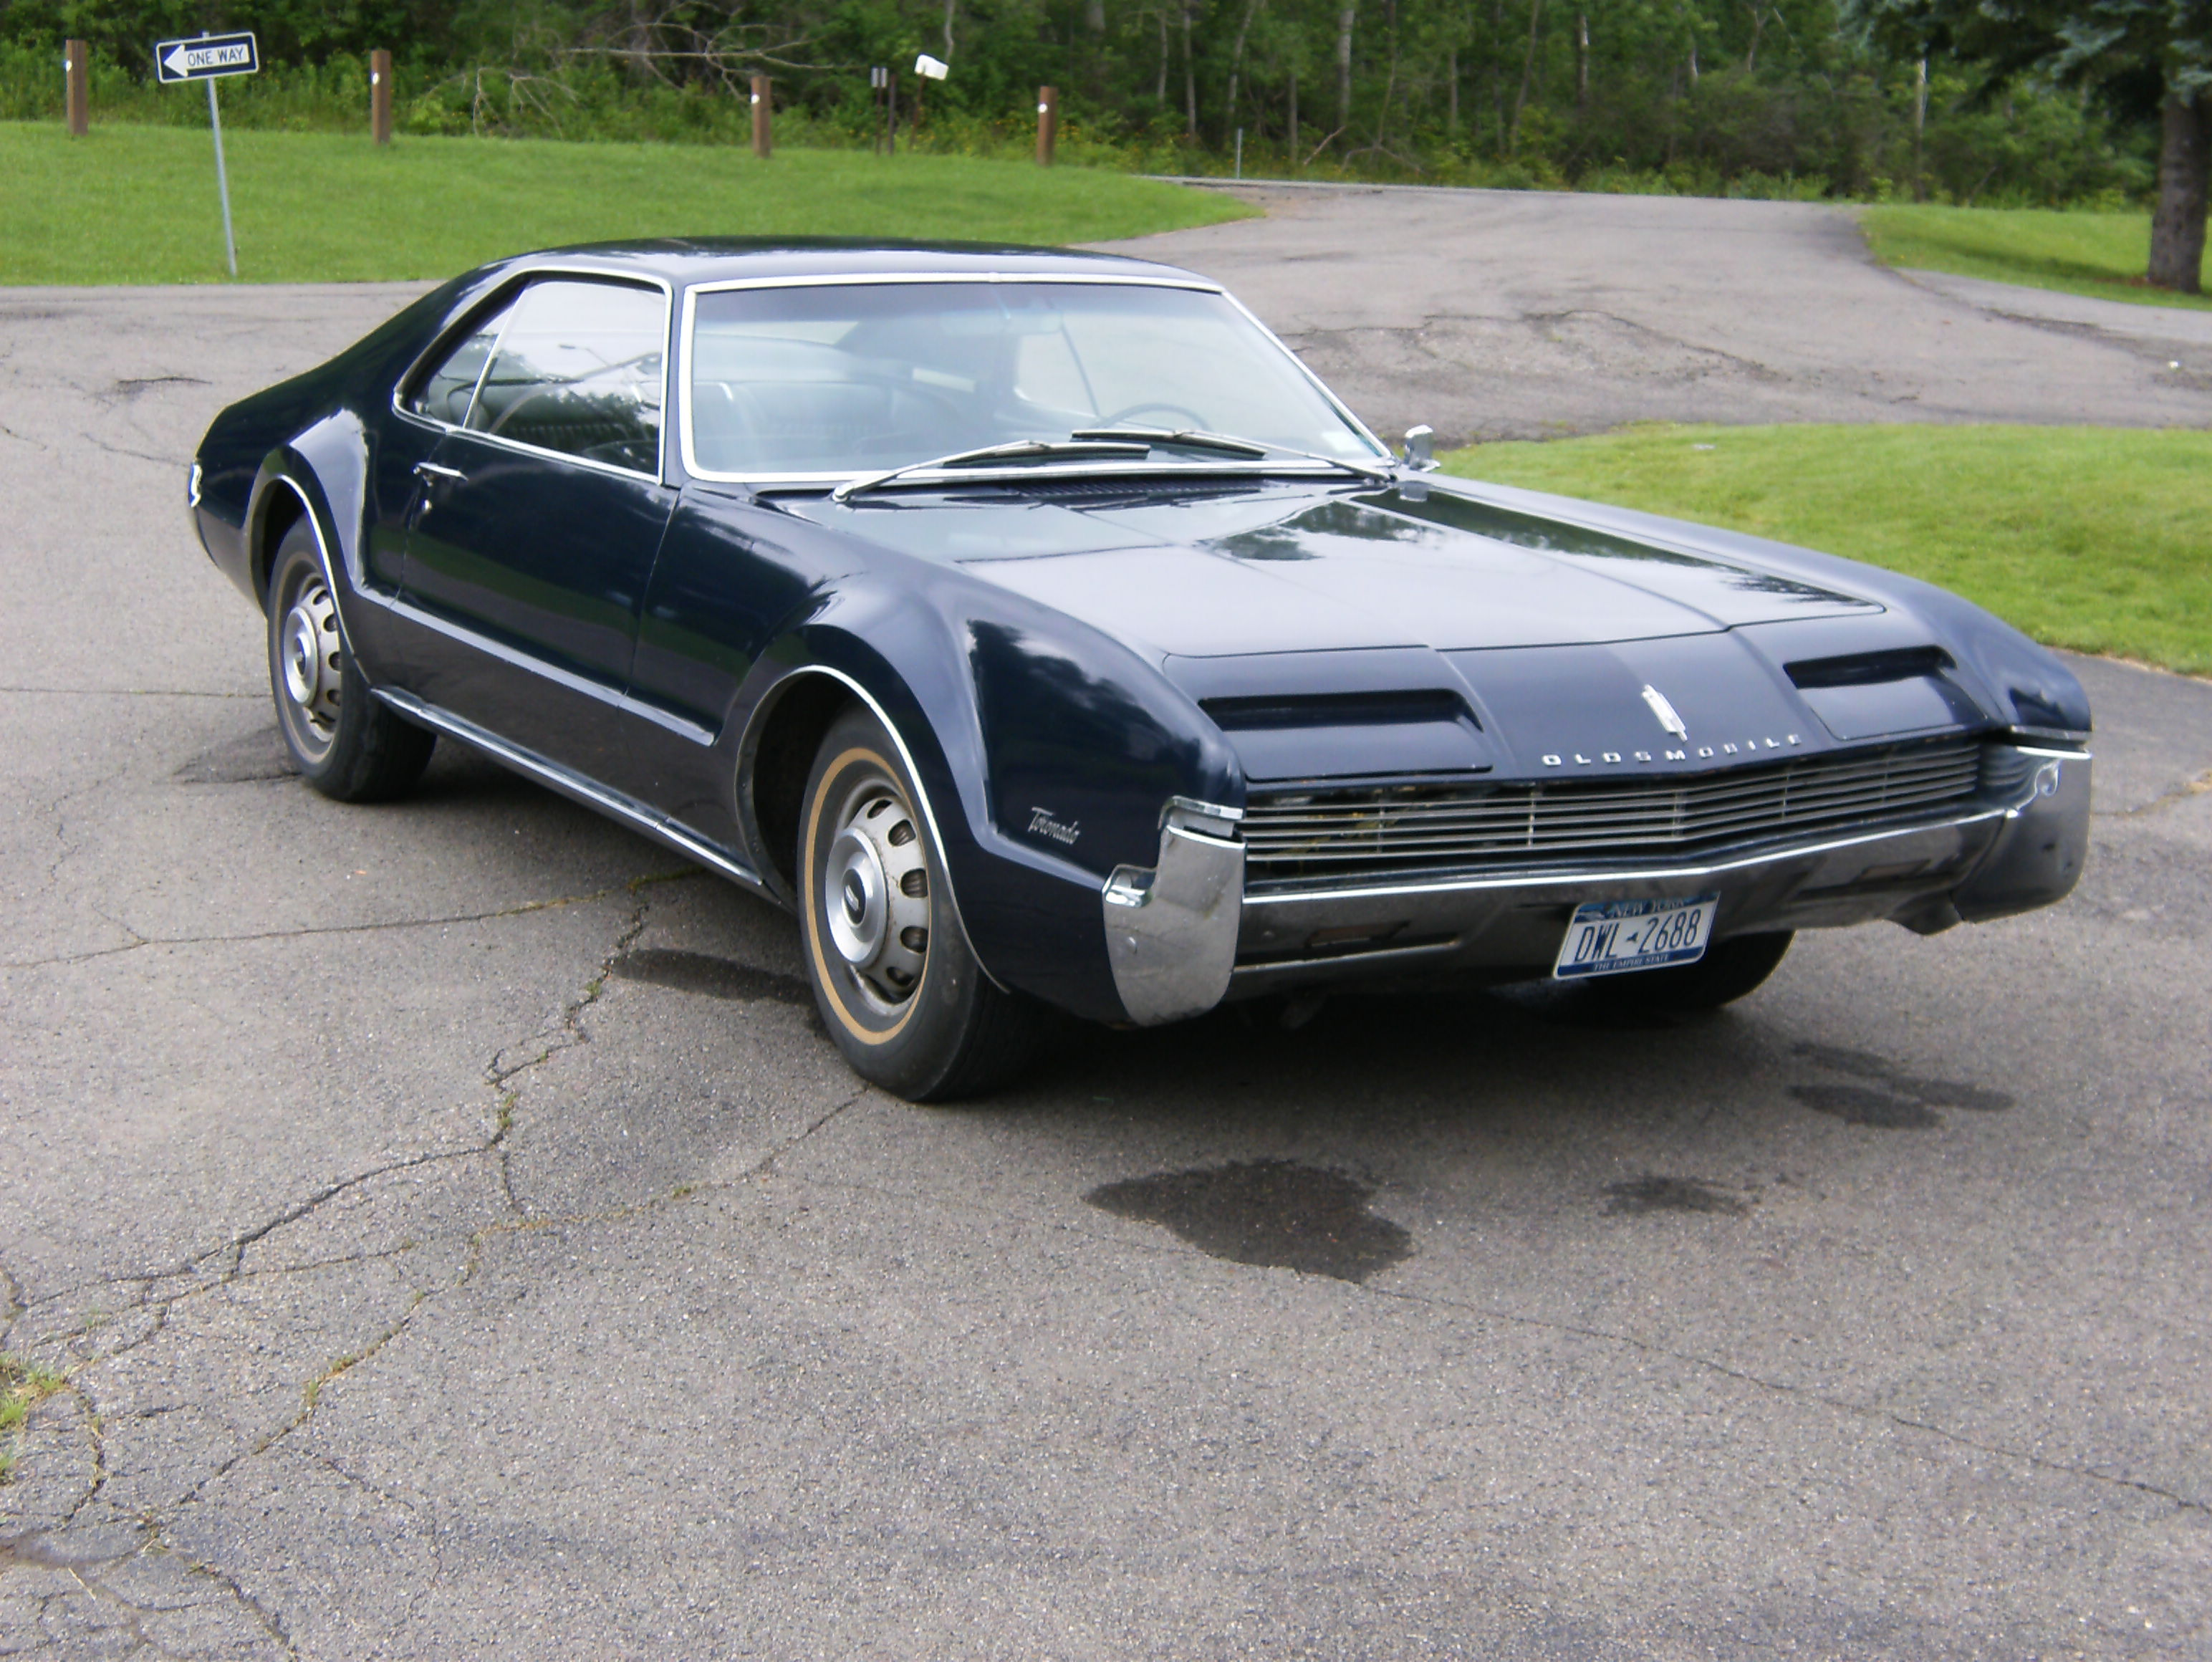 1966 Toronado - Kool factor of